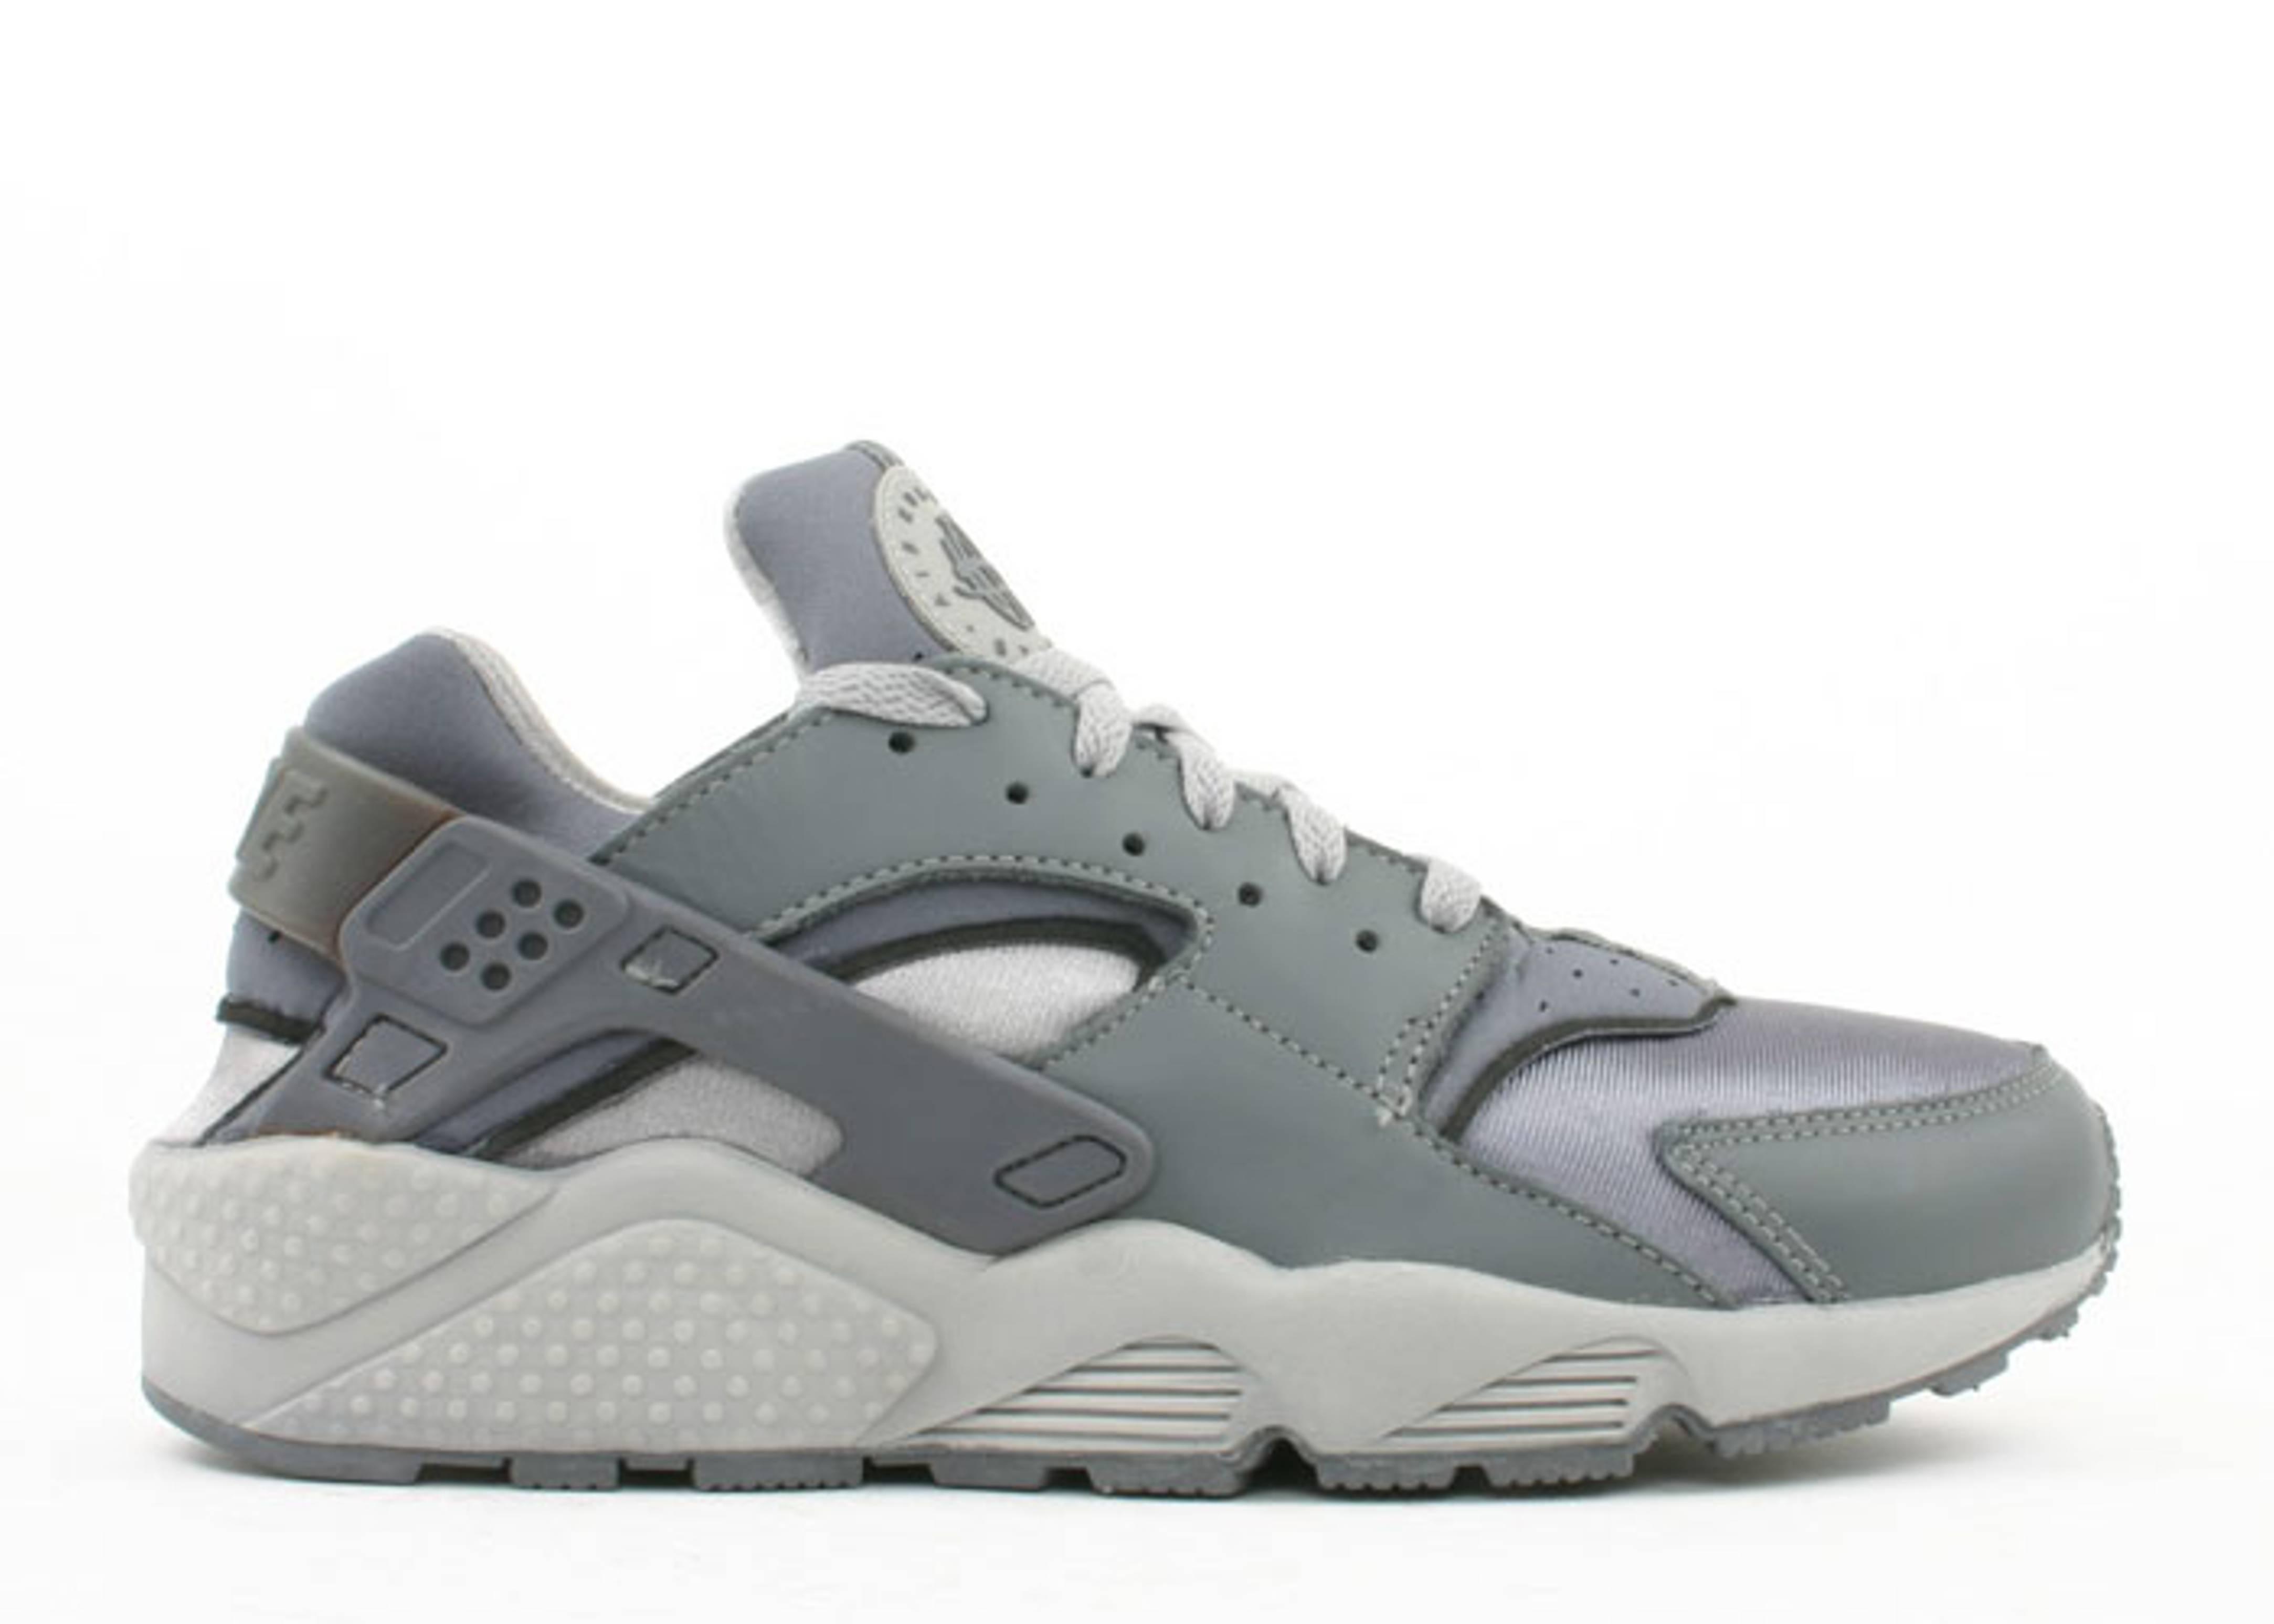 37a98149e02c Air Huarache Le - Nike - 609020 003 - light graphite medium grey ...